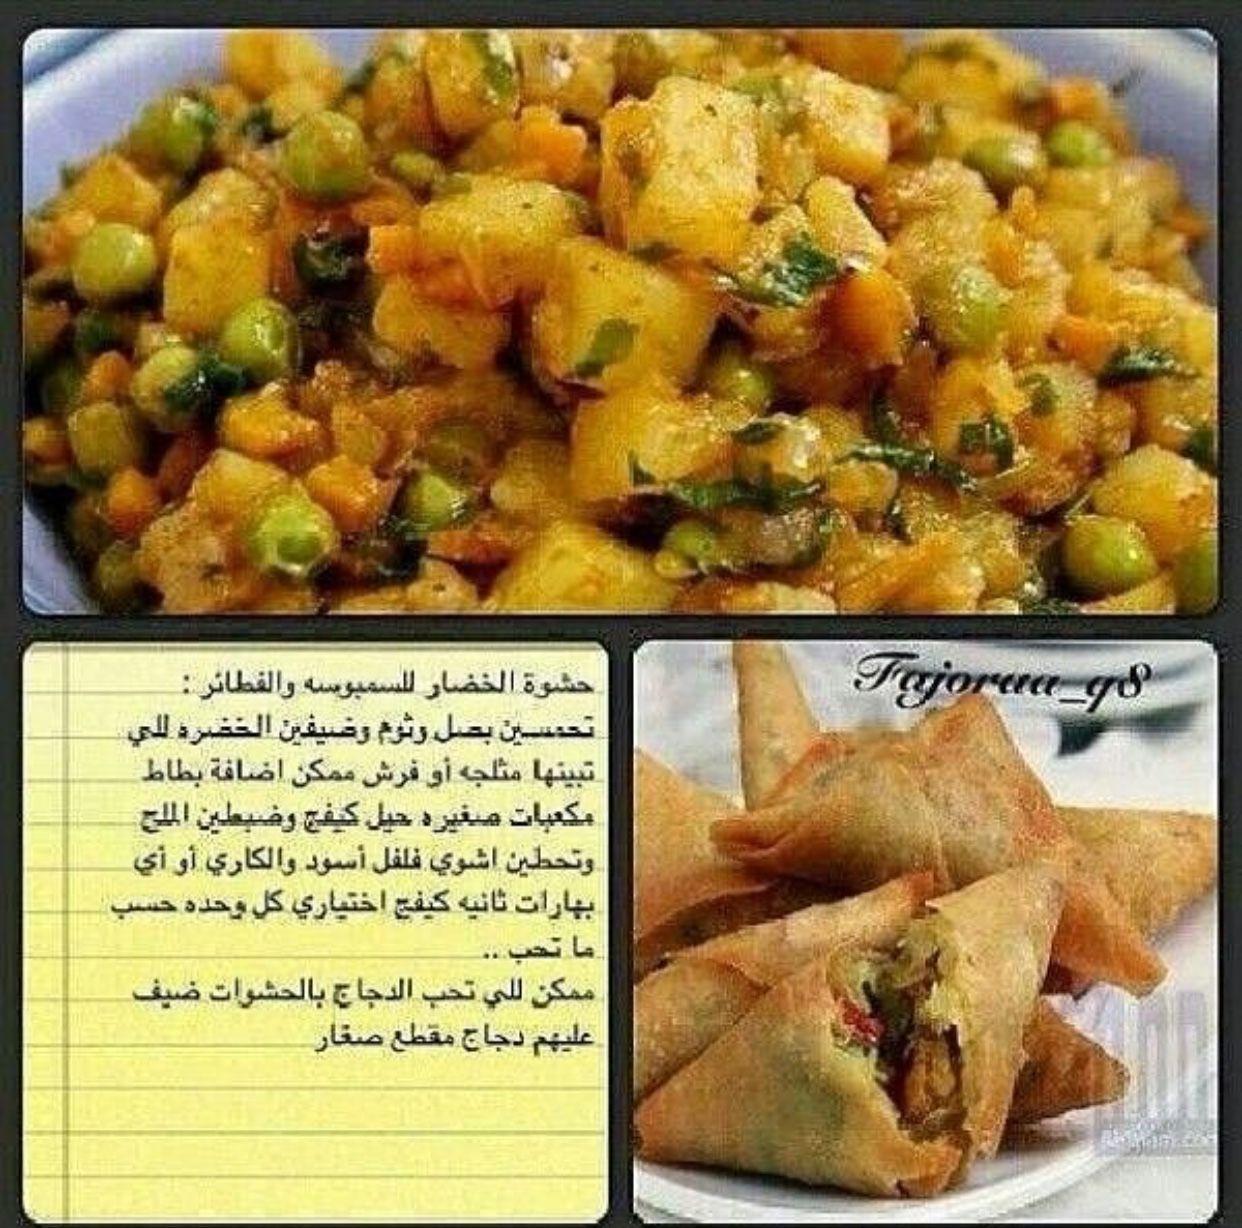 حشوة خضار للسمبوسة والفطائر Cookout Food Indian Food Recipes Food Receipes